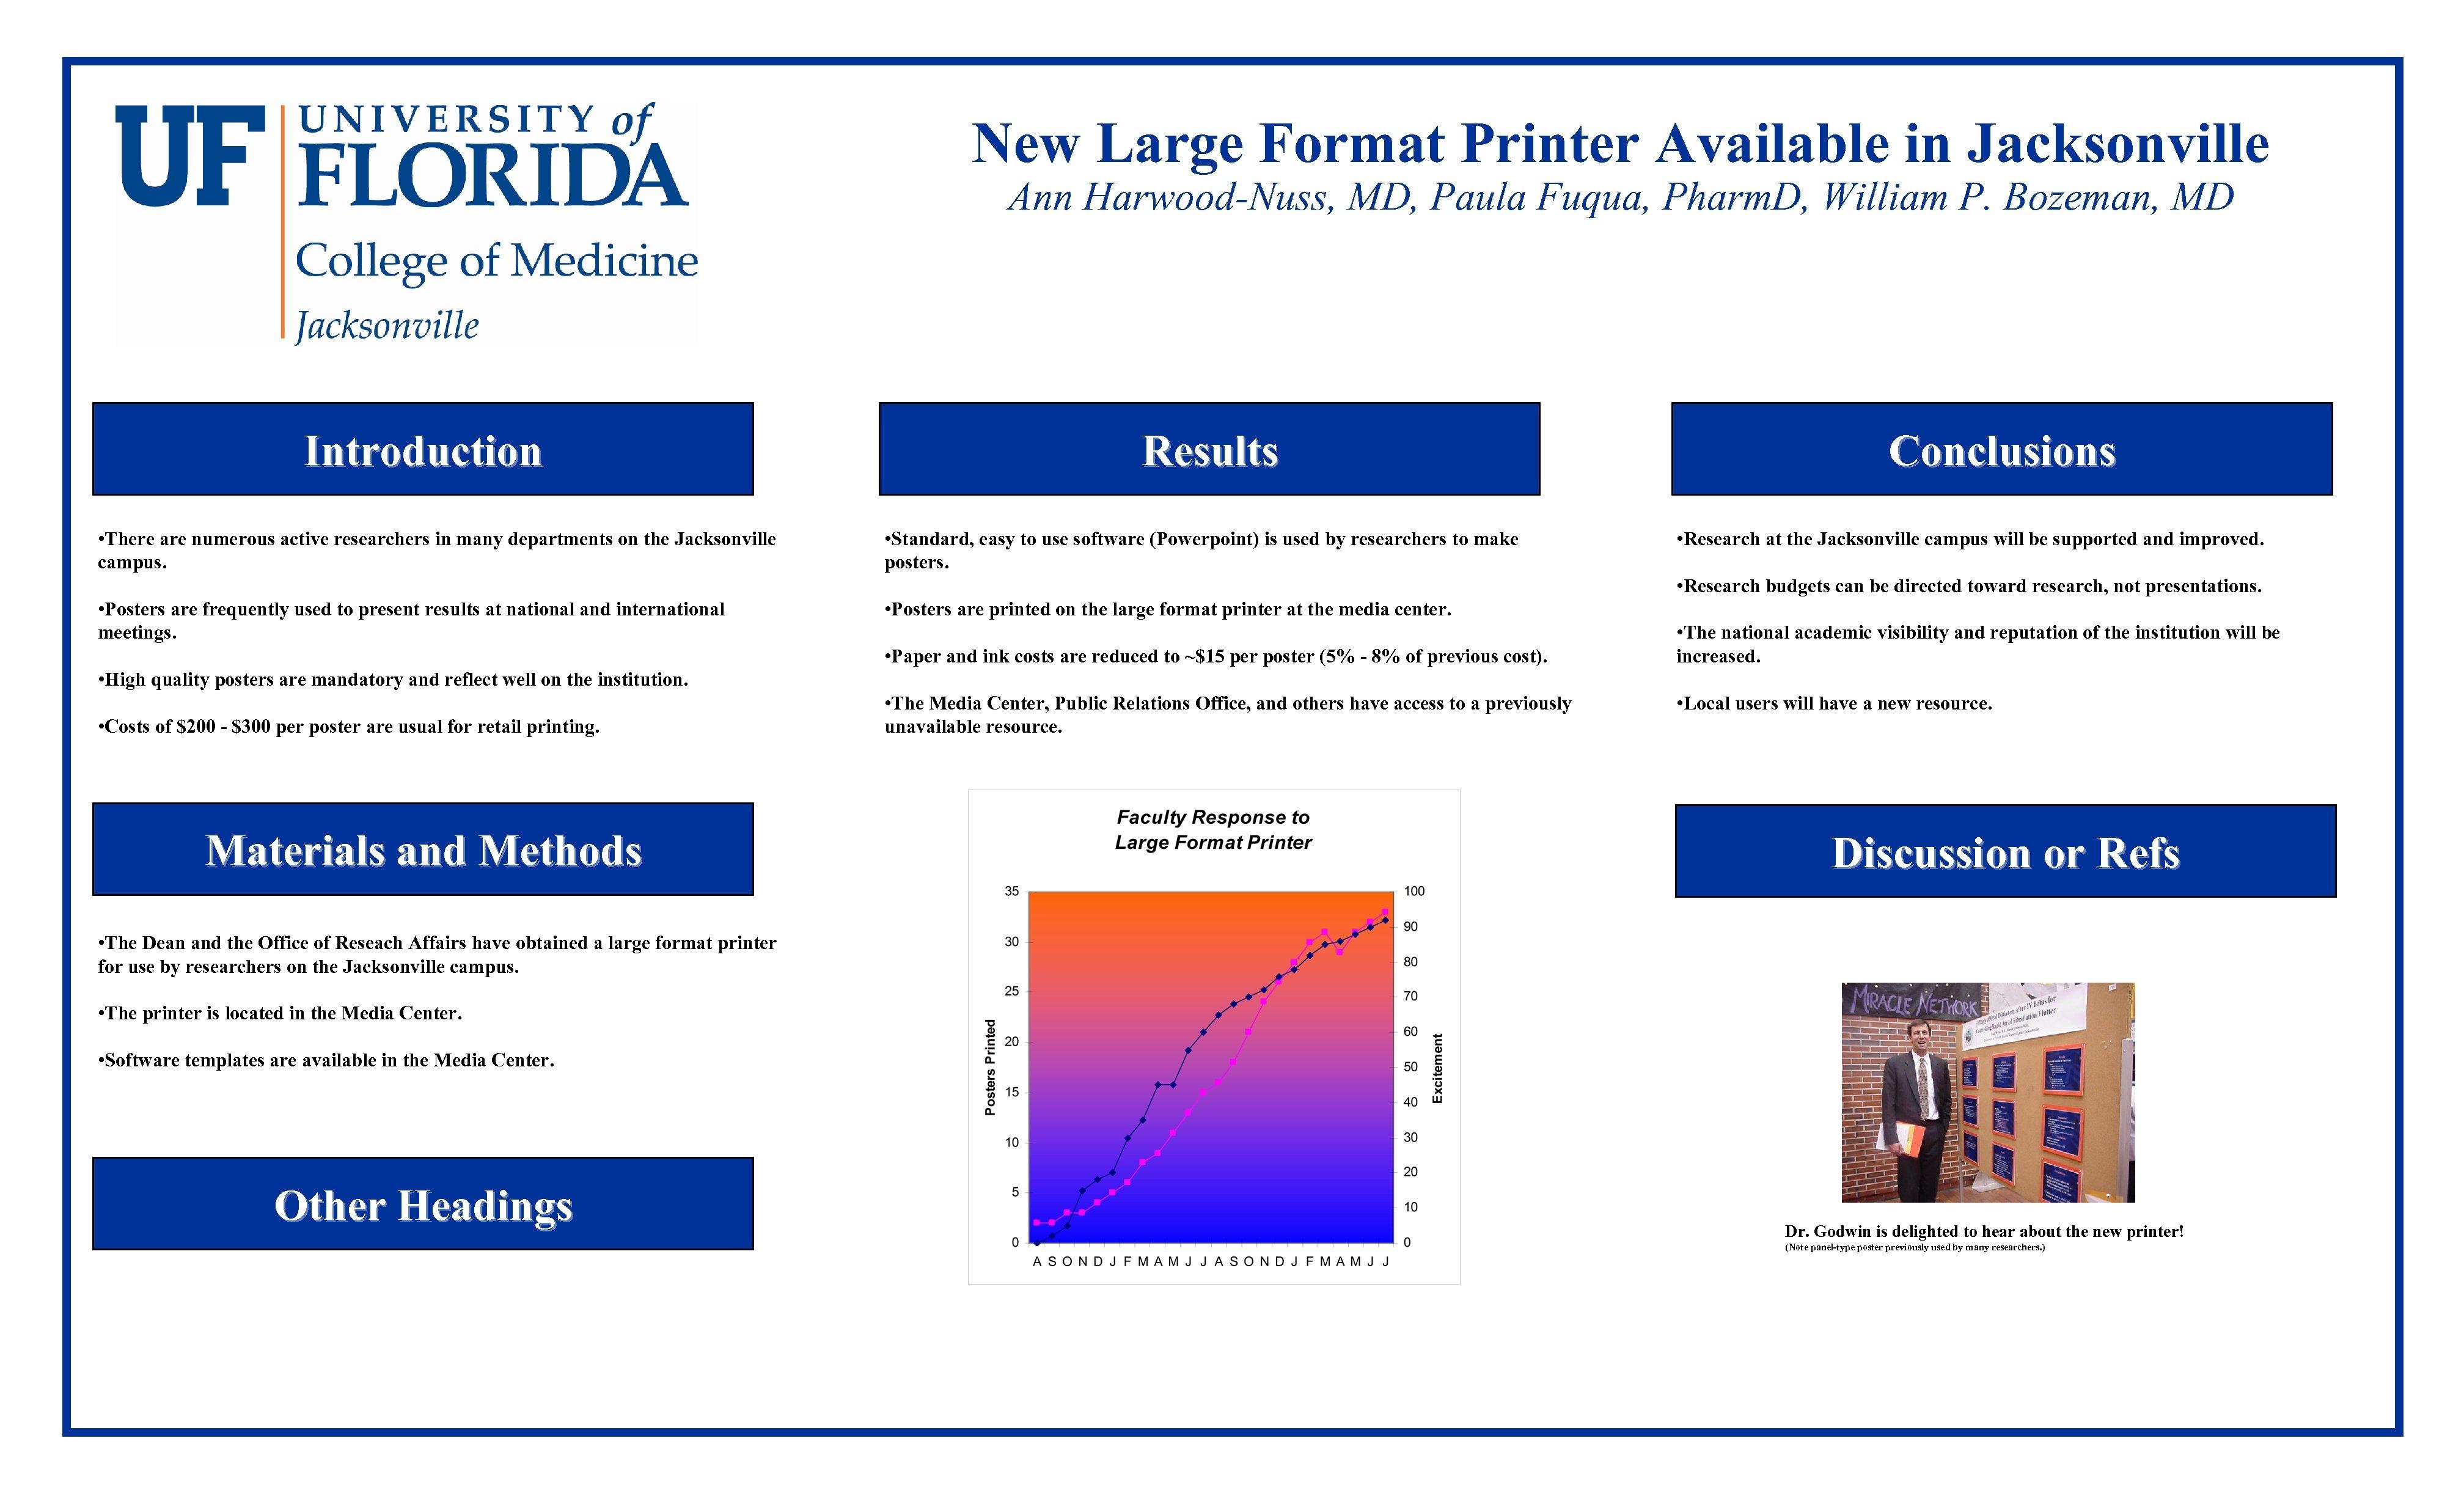 New Large Format Printer Available in Jacksonville Ann Harwood-Nuss, MD, Paula Fuqua, Pharm. D,